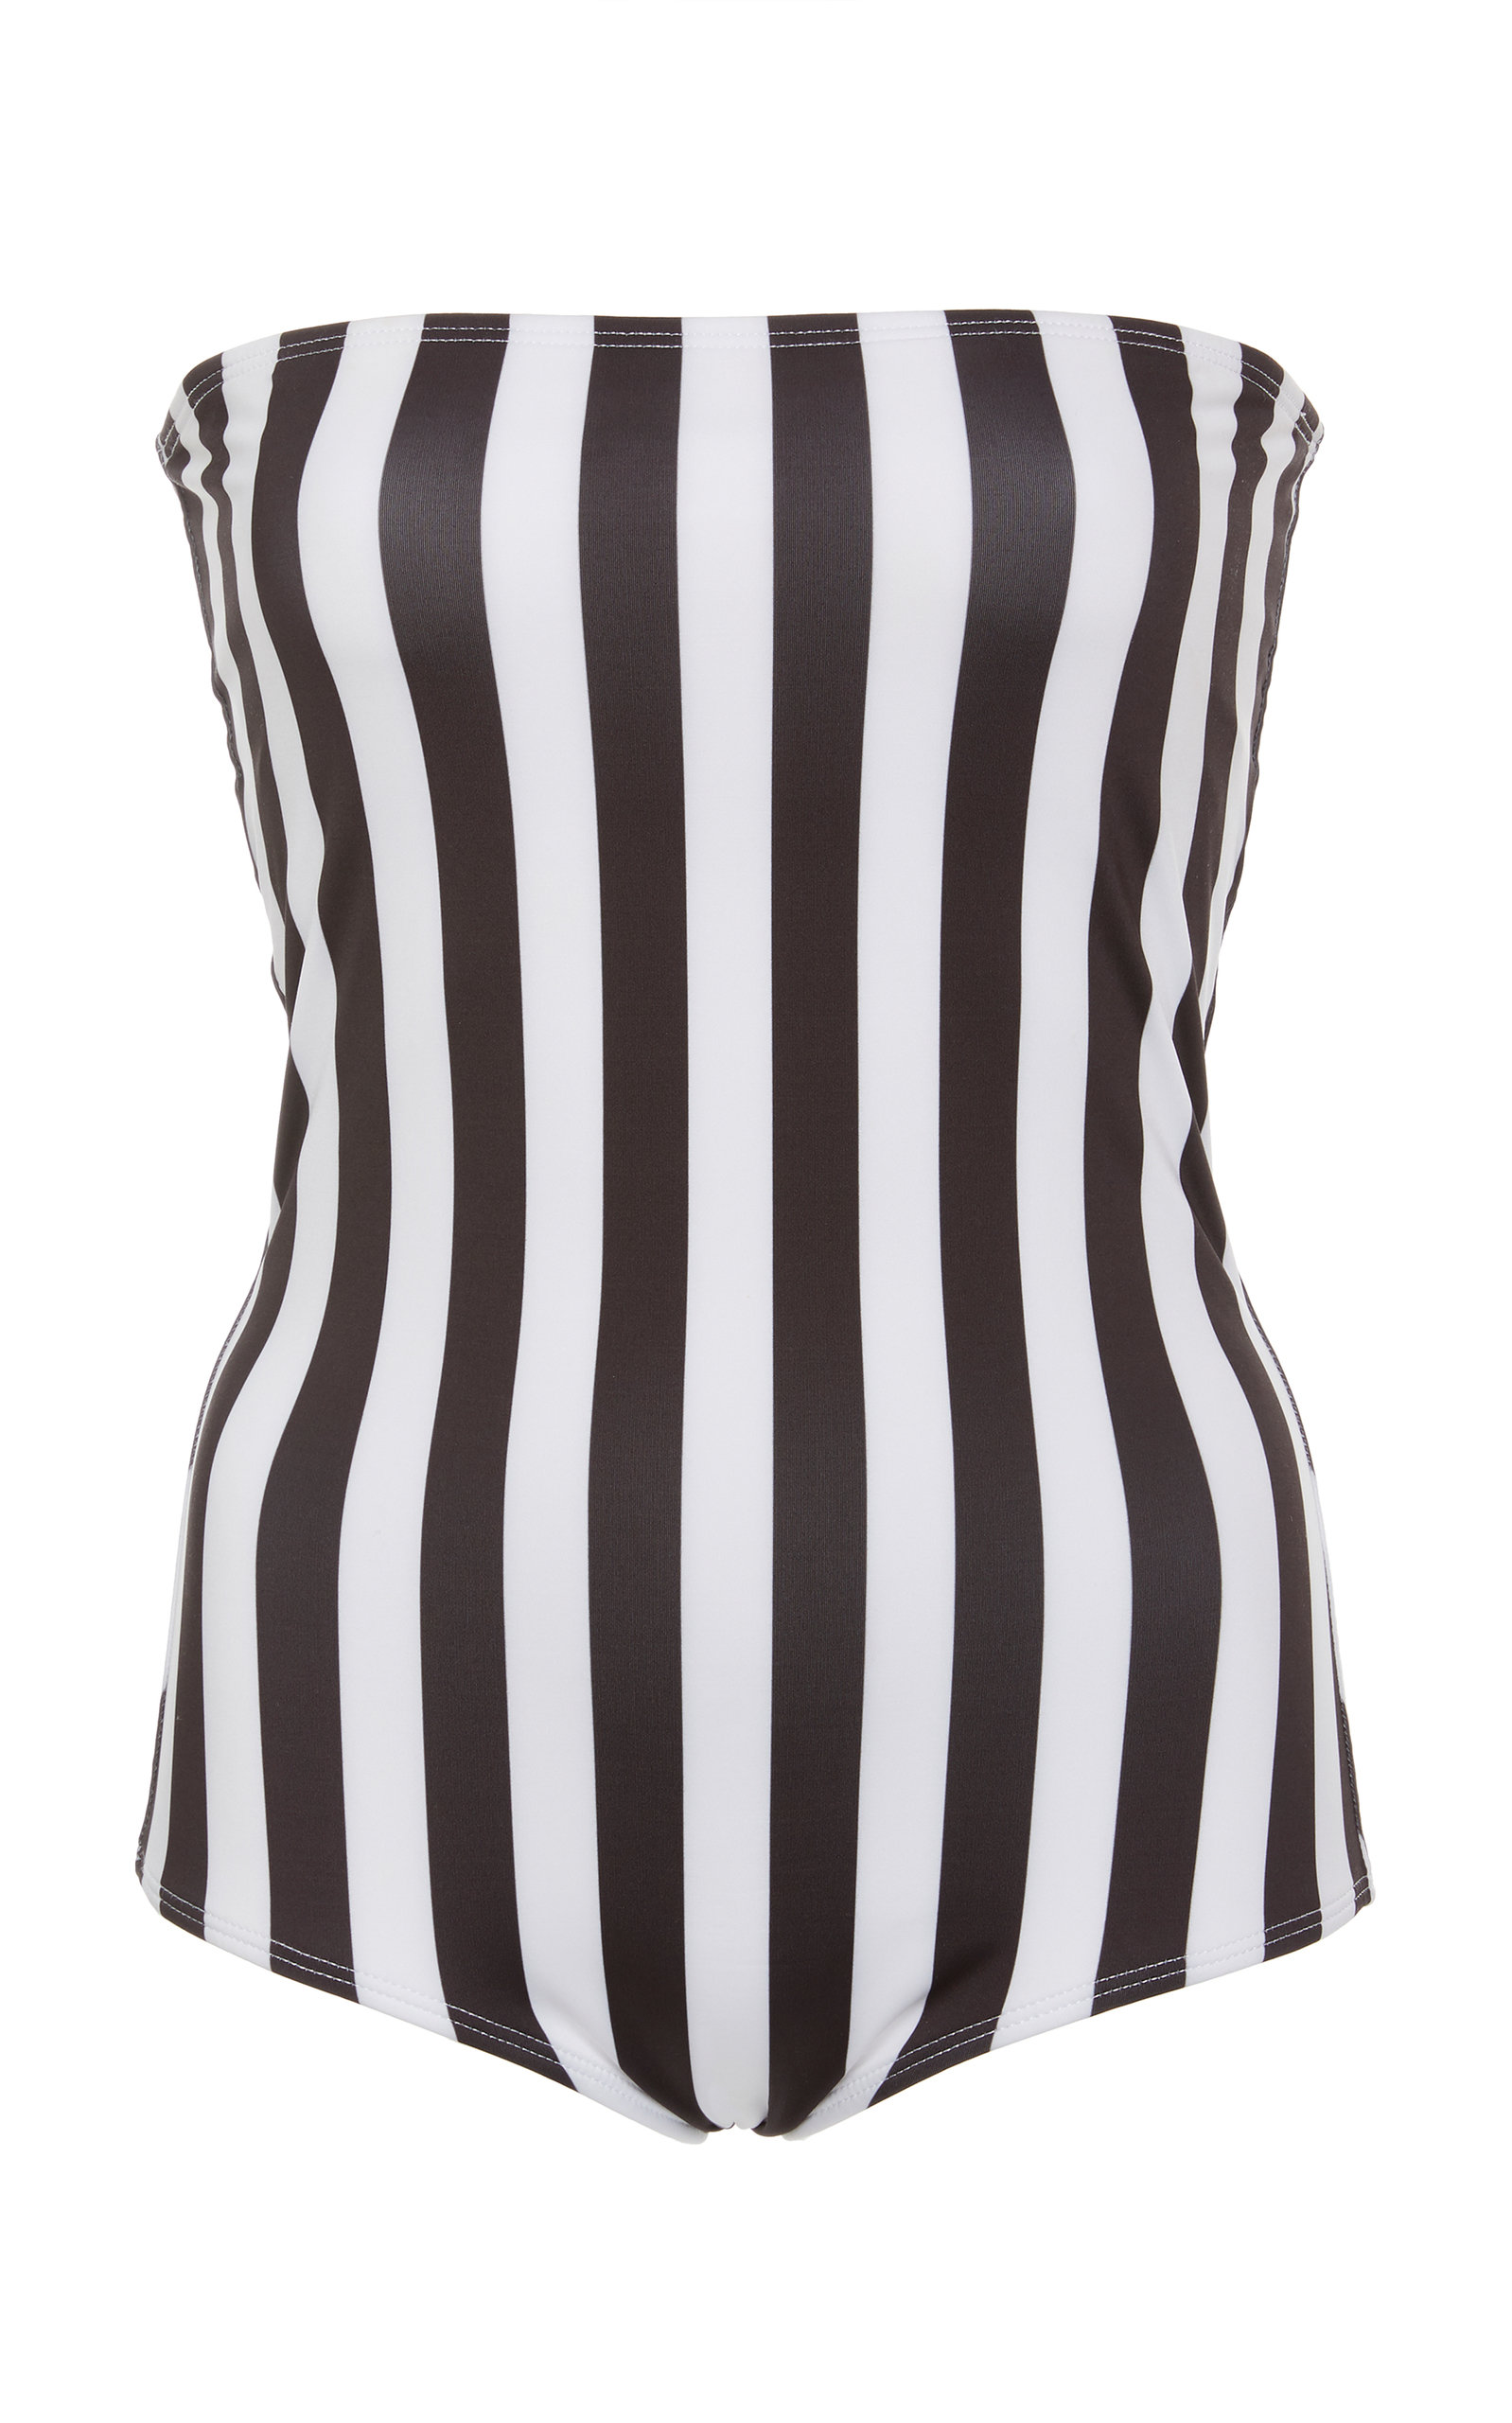 VERDE LIMON Tijuana Strapless One Piece Swimsuit in Black/White